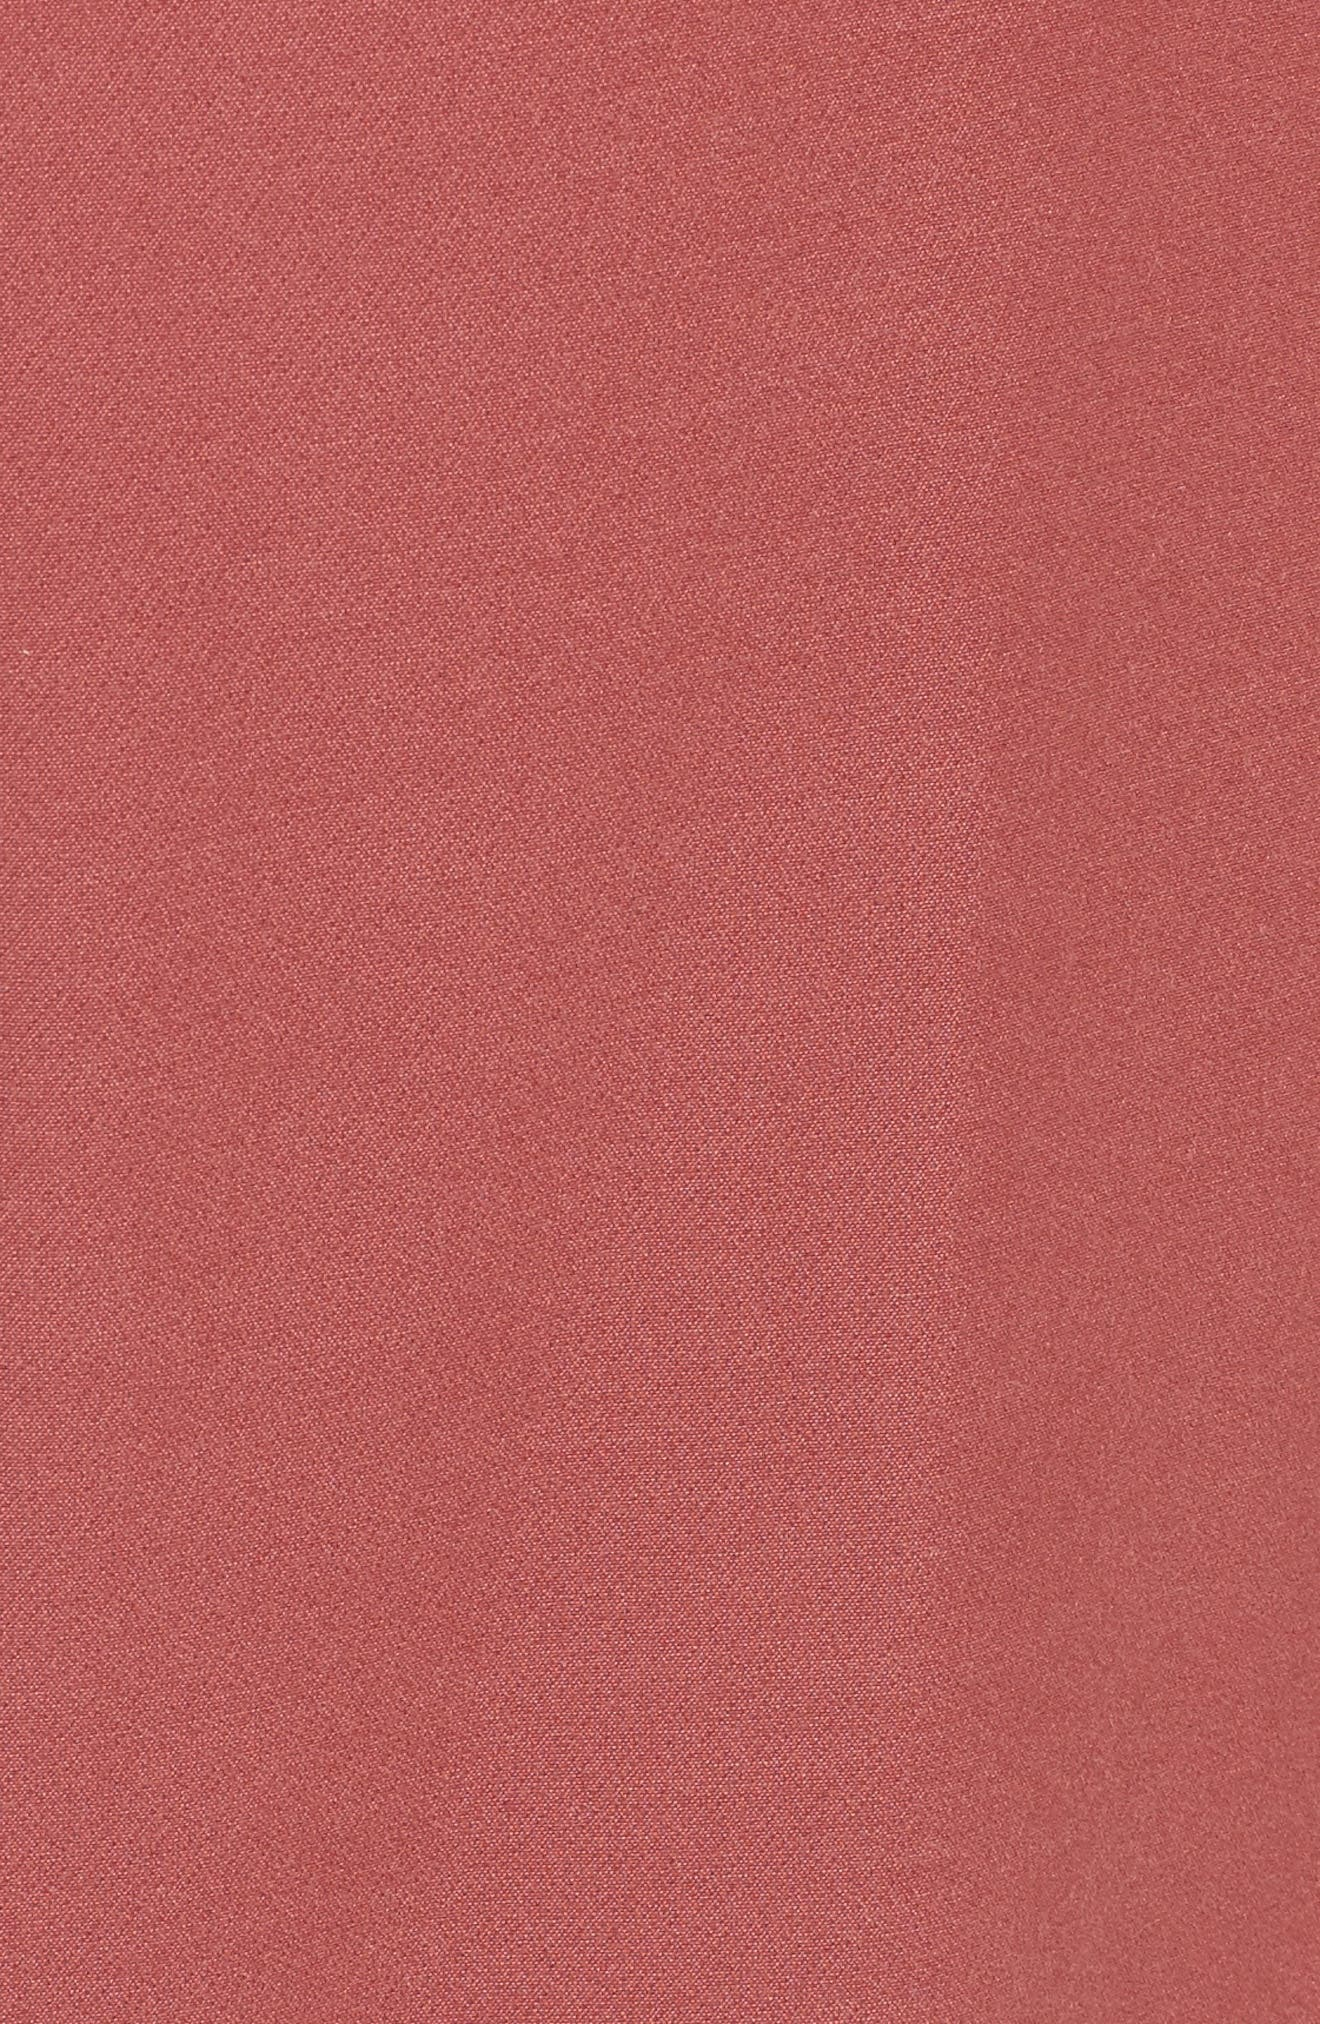 Stretch Suiting Crop Pants,                             Alternate thumbnail 5, color,                             950